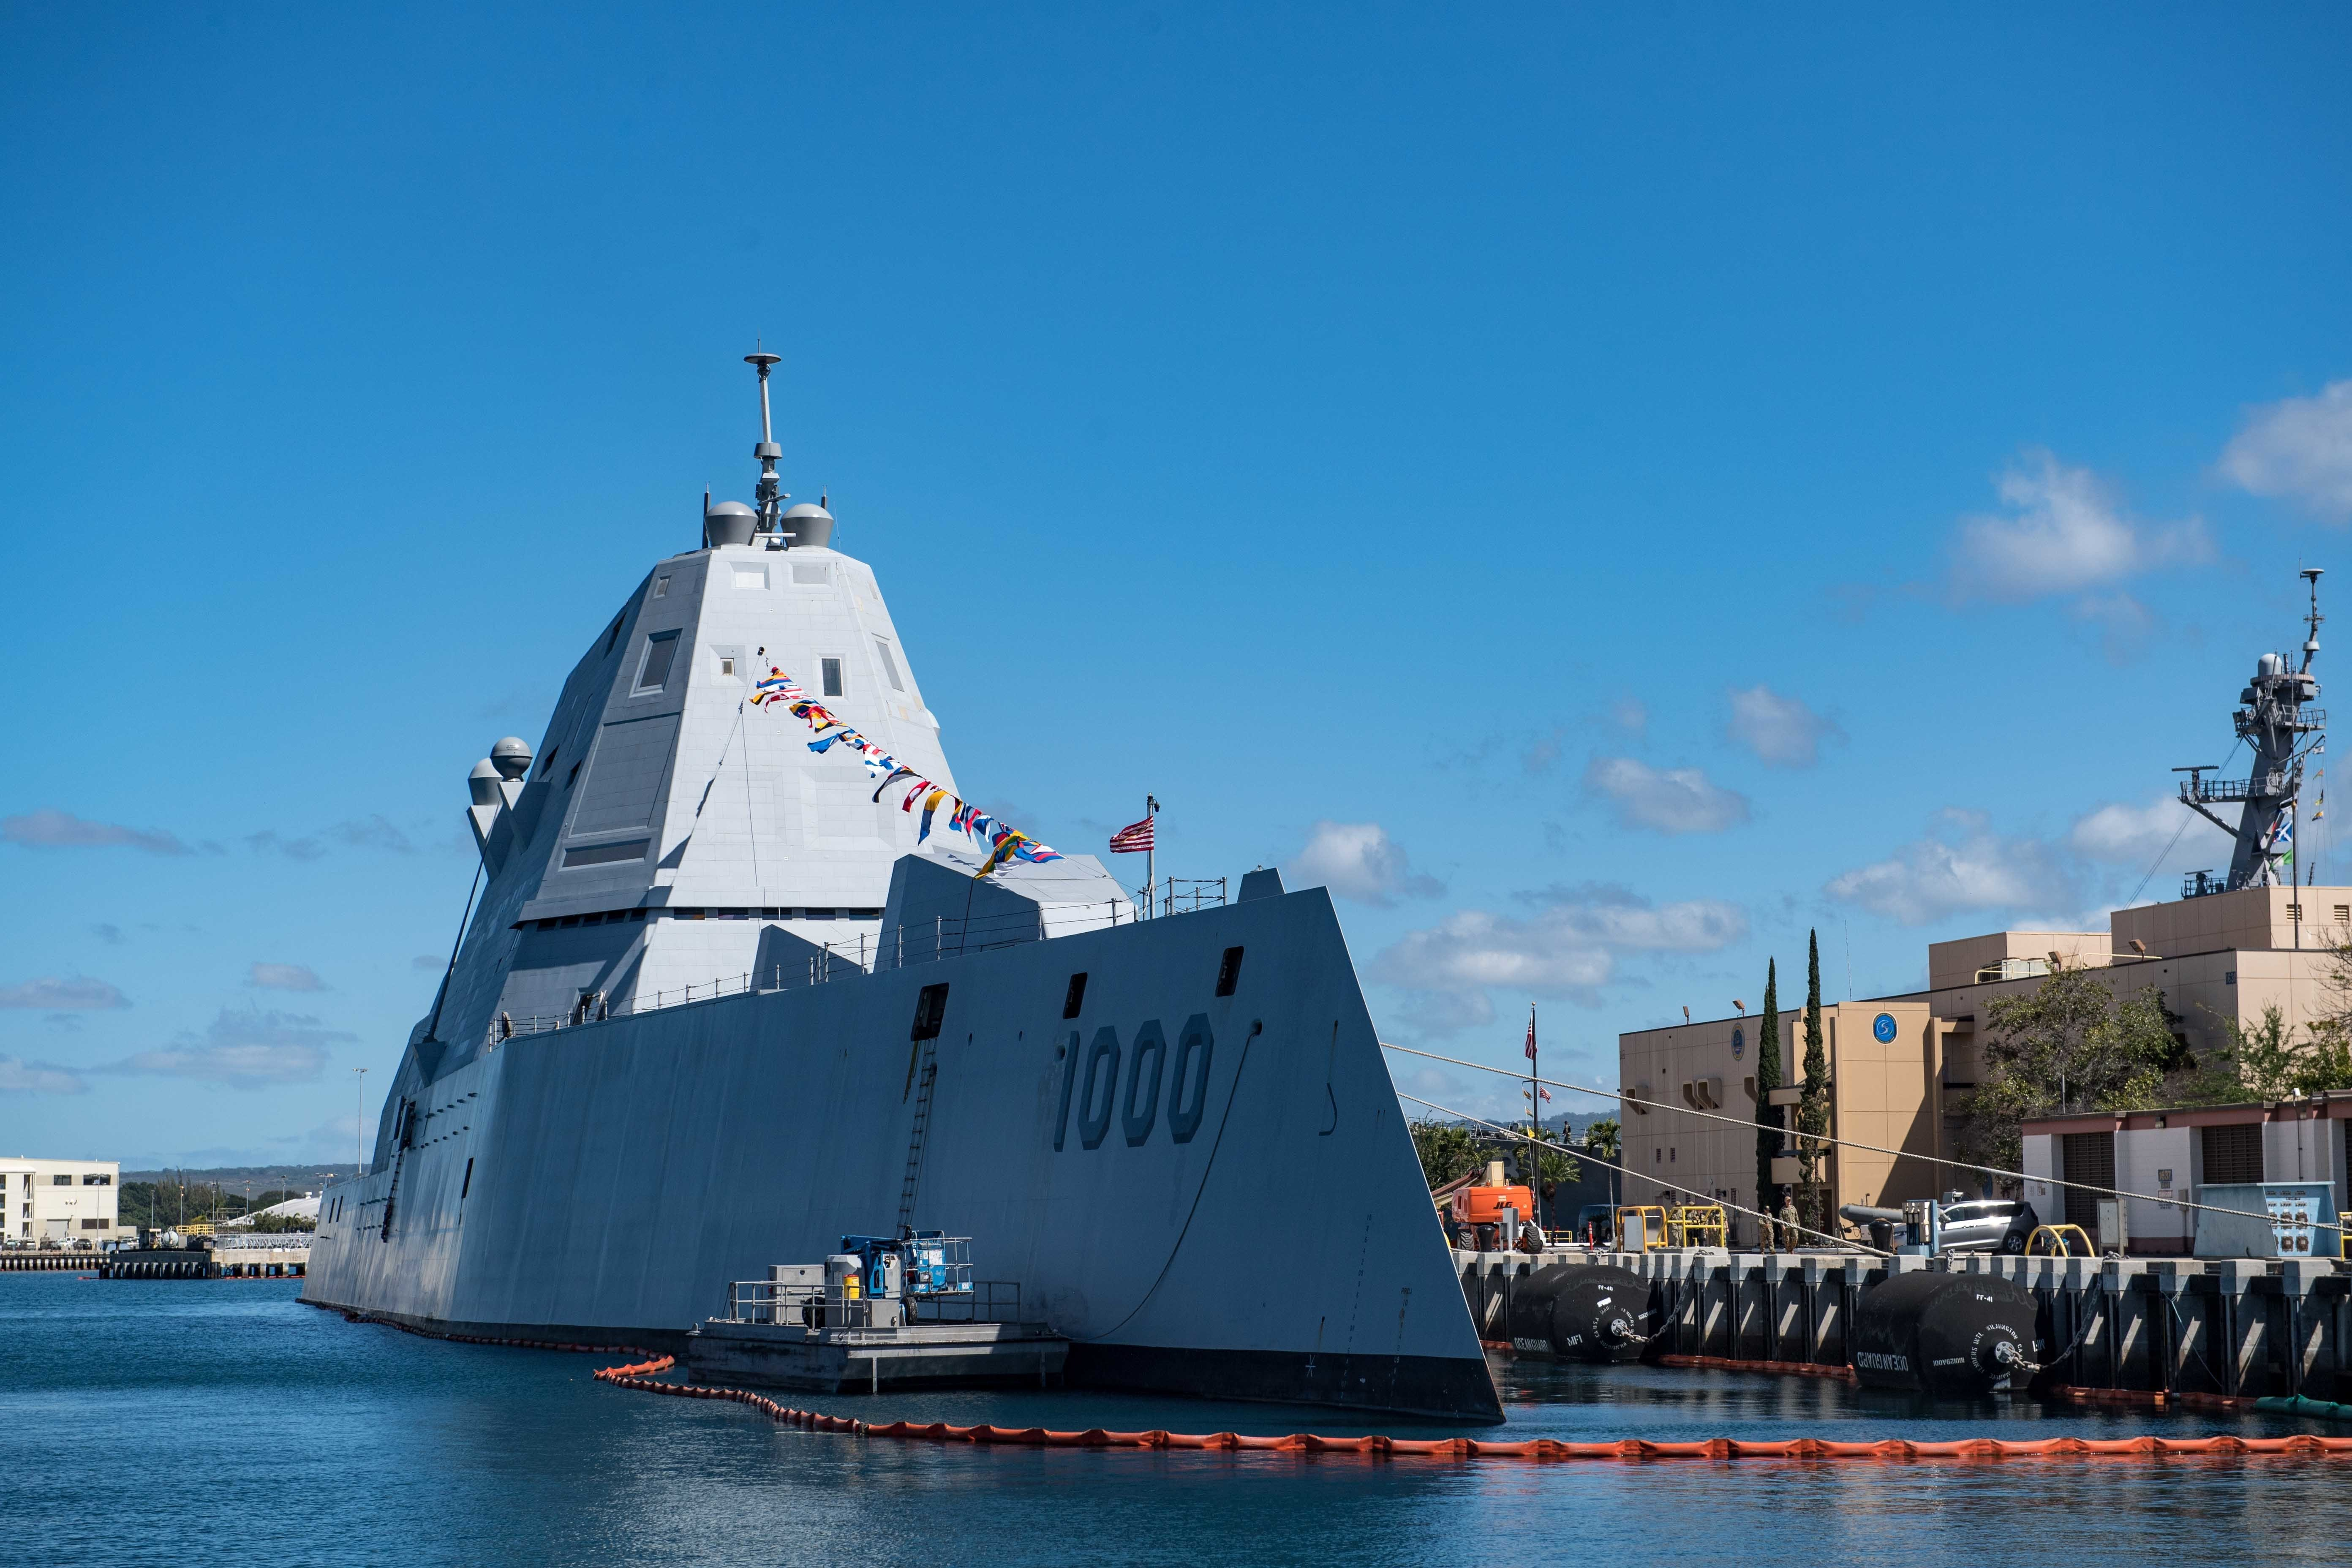 Destroyer Uss Zumwalt Delivers To Navy After Combat System Activation Usni News